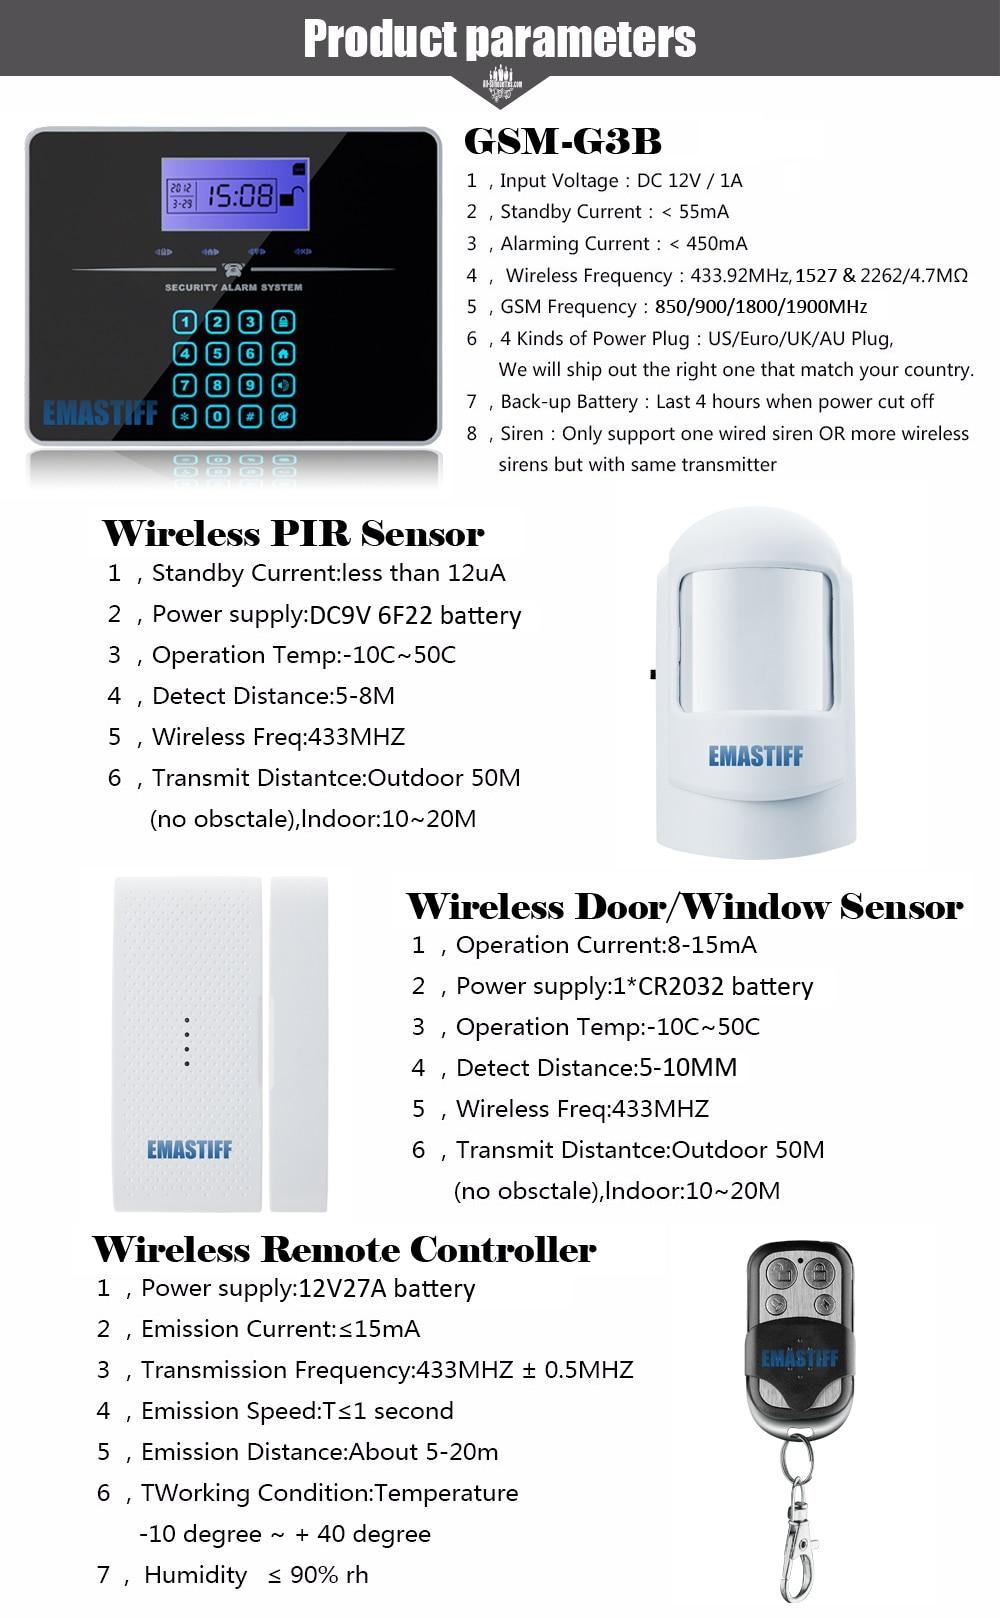 Touch Keypad G3b English Lcd Wireless 433mhz Sms Gsm Home Automation An Expandable Multi Zone Modular Burglar Alarm Htb10rlxrpxxxxaxxpxxq6xxfxxxb